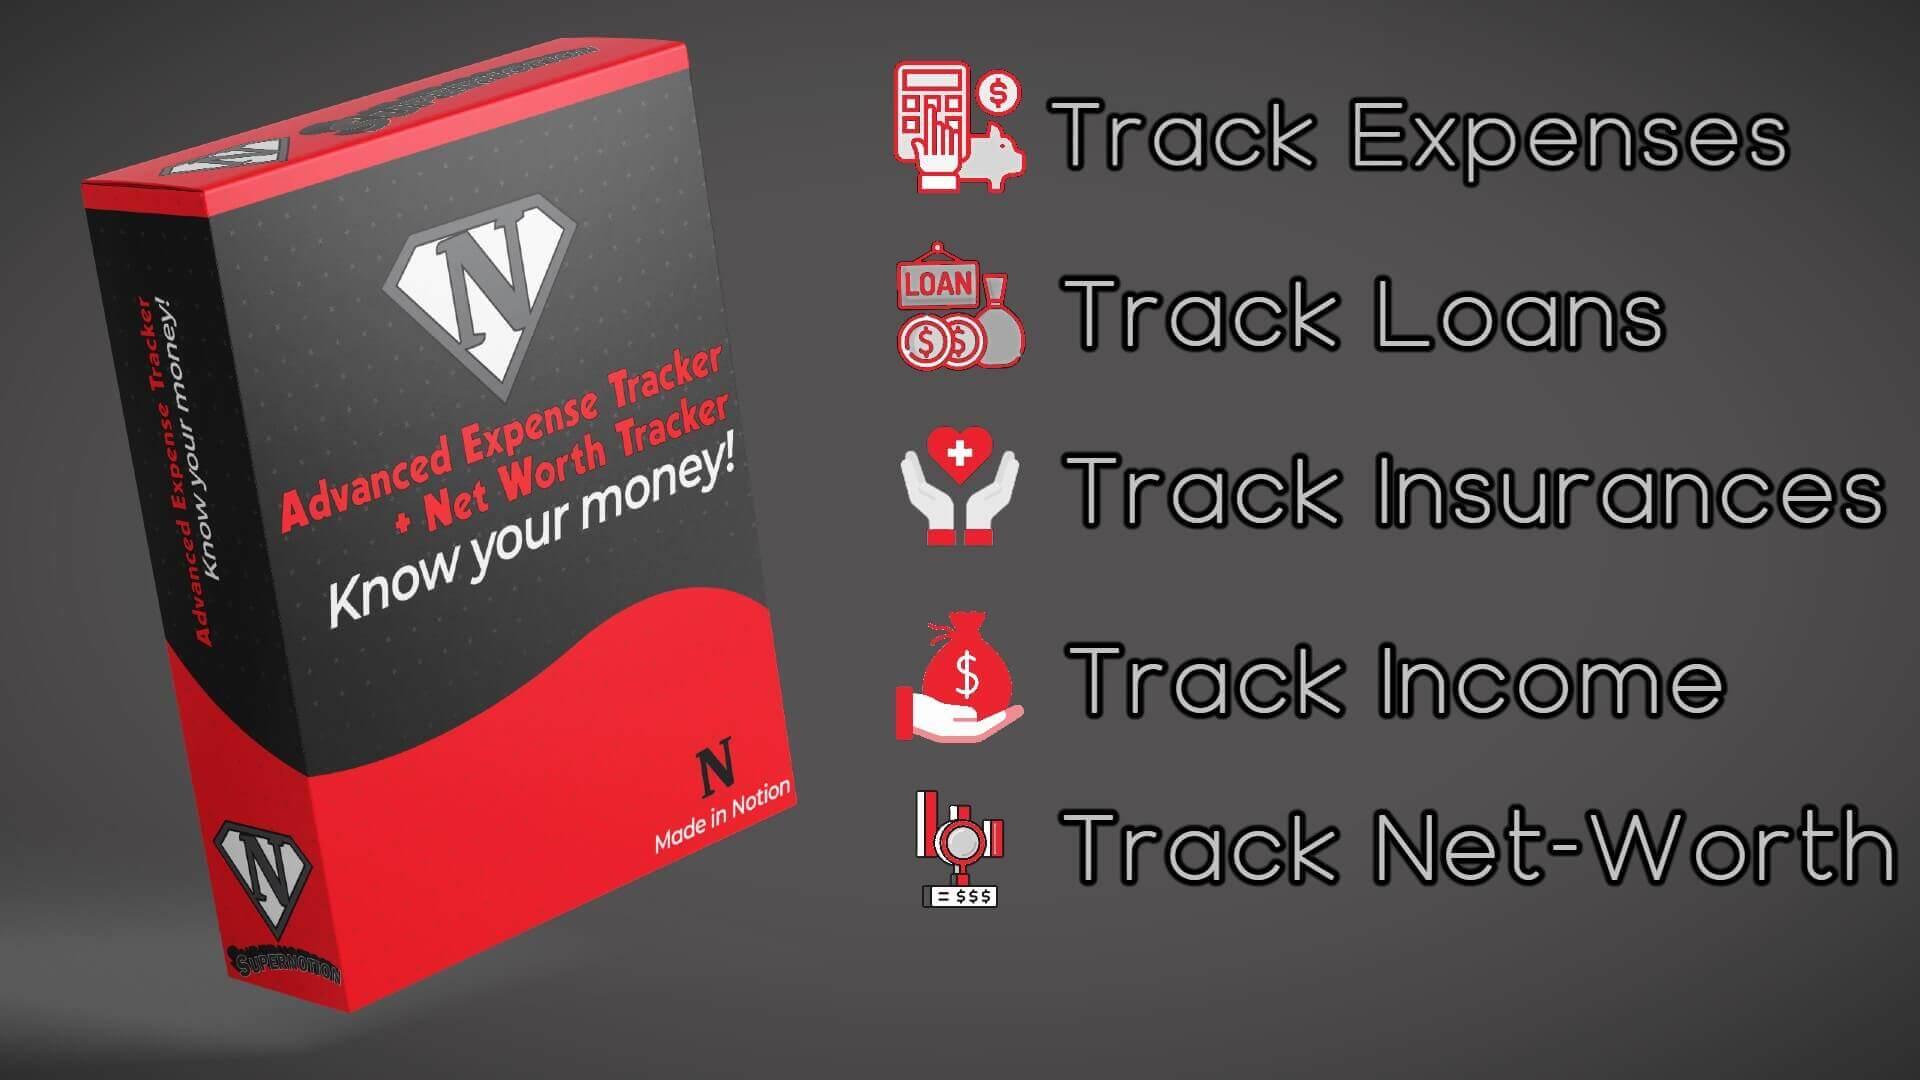 Advanced Expense Tracker + Net worth Calculator